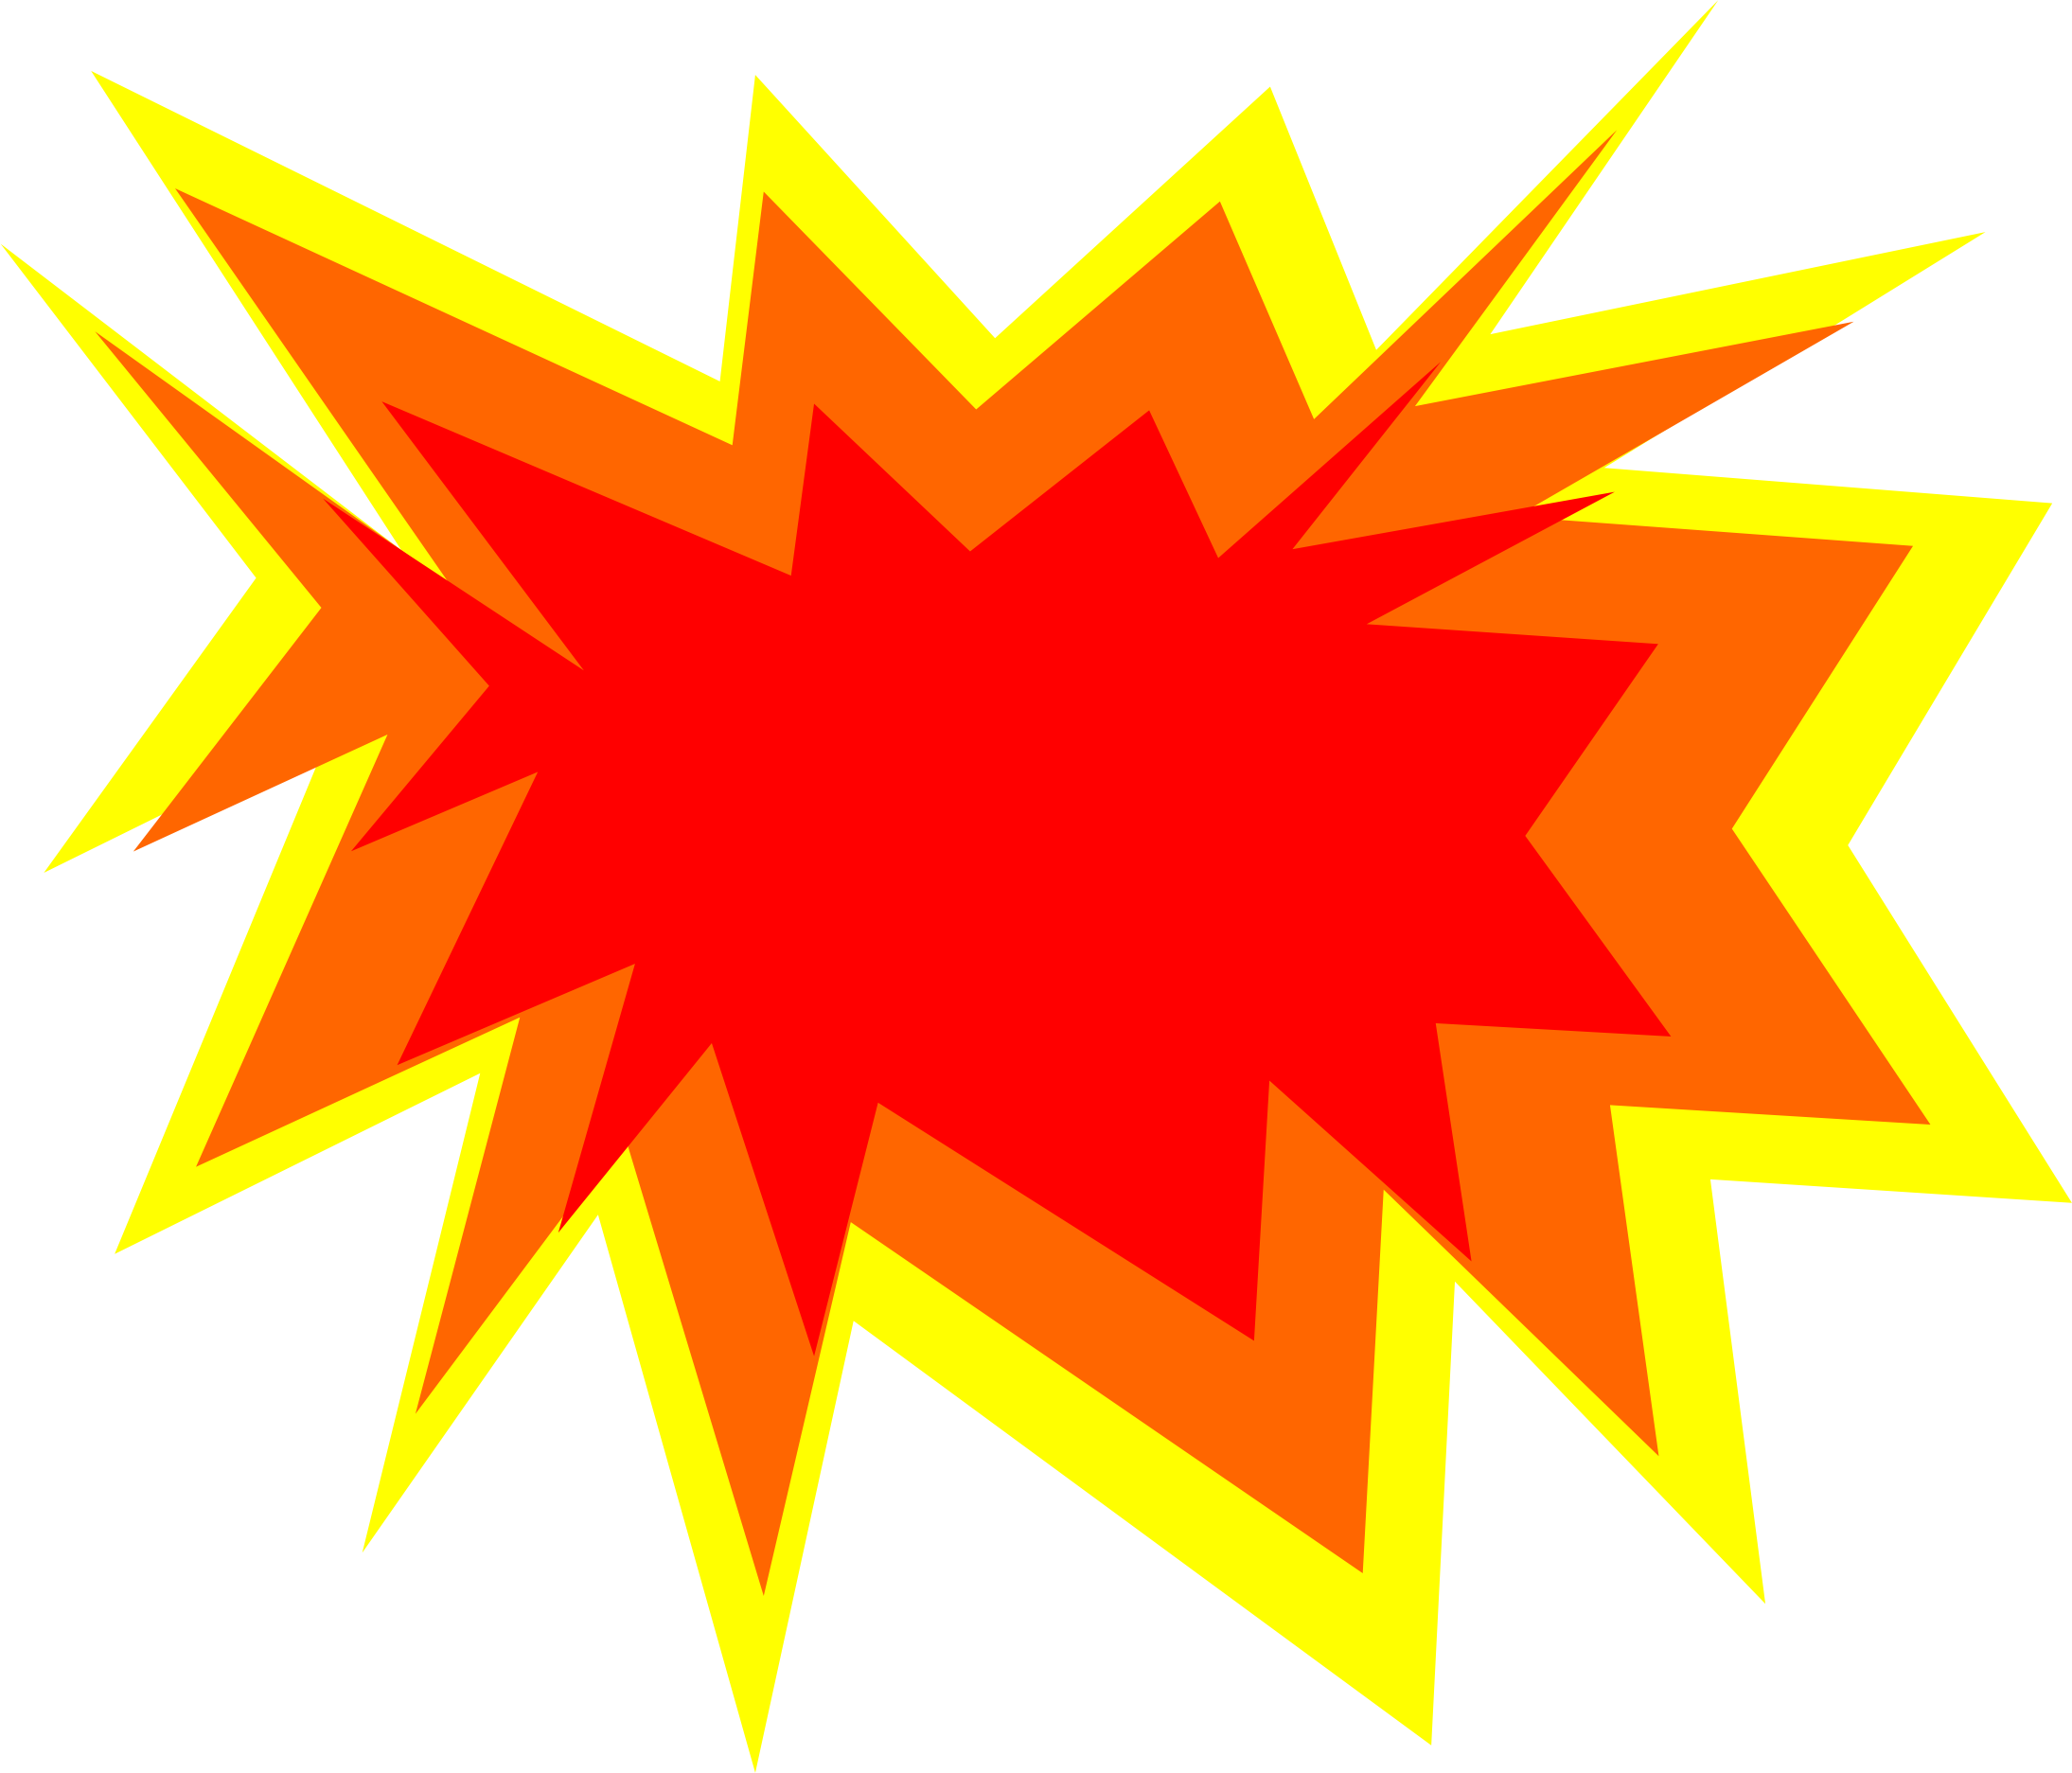 Explosion Clip